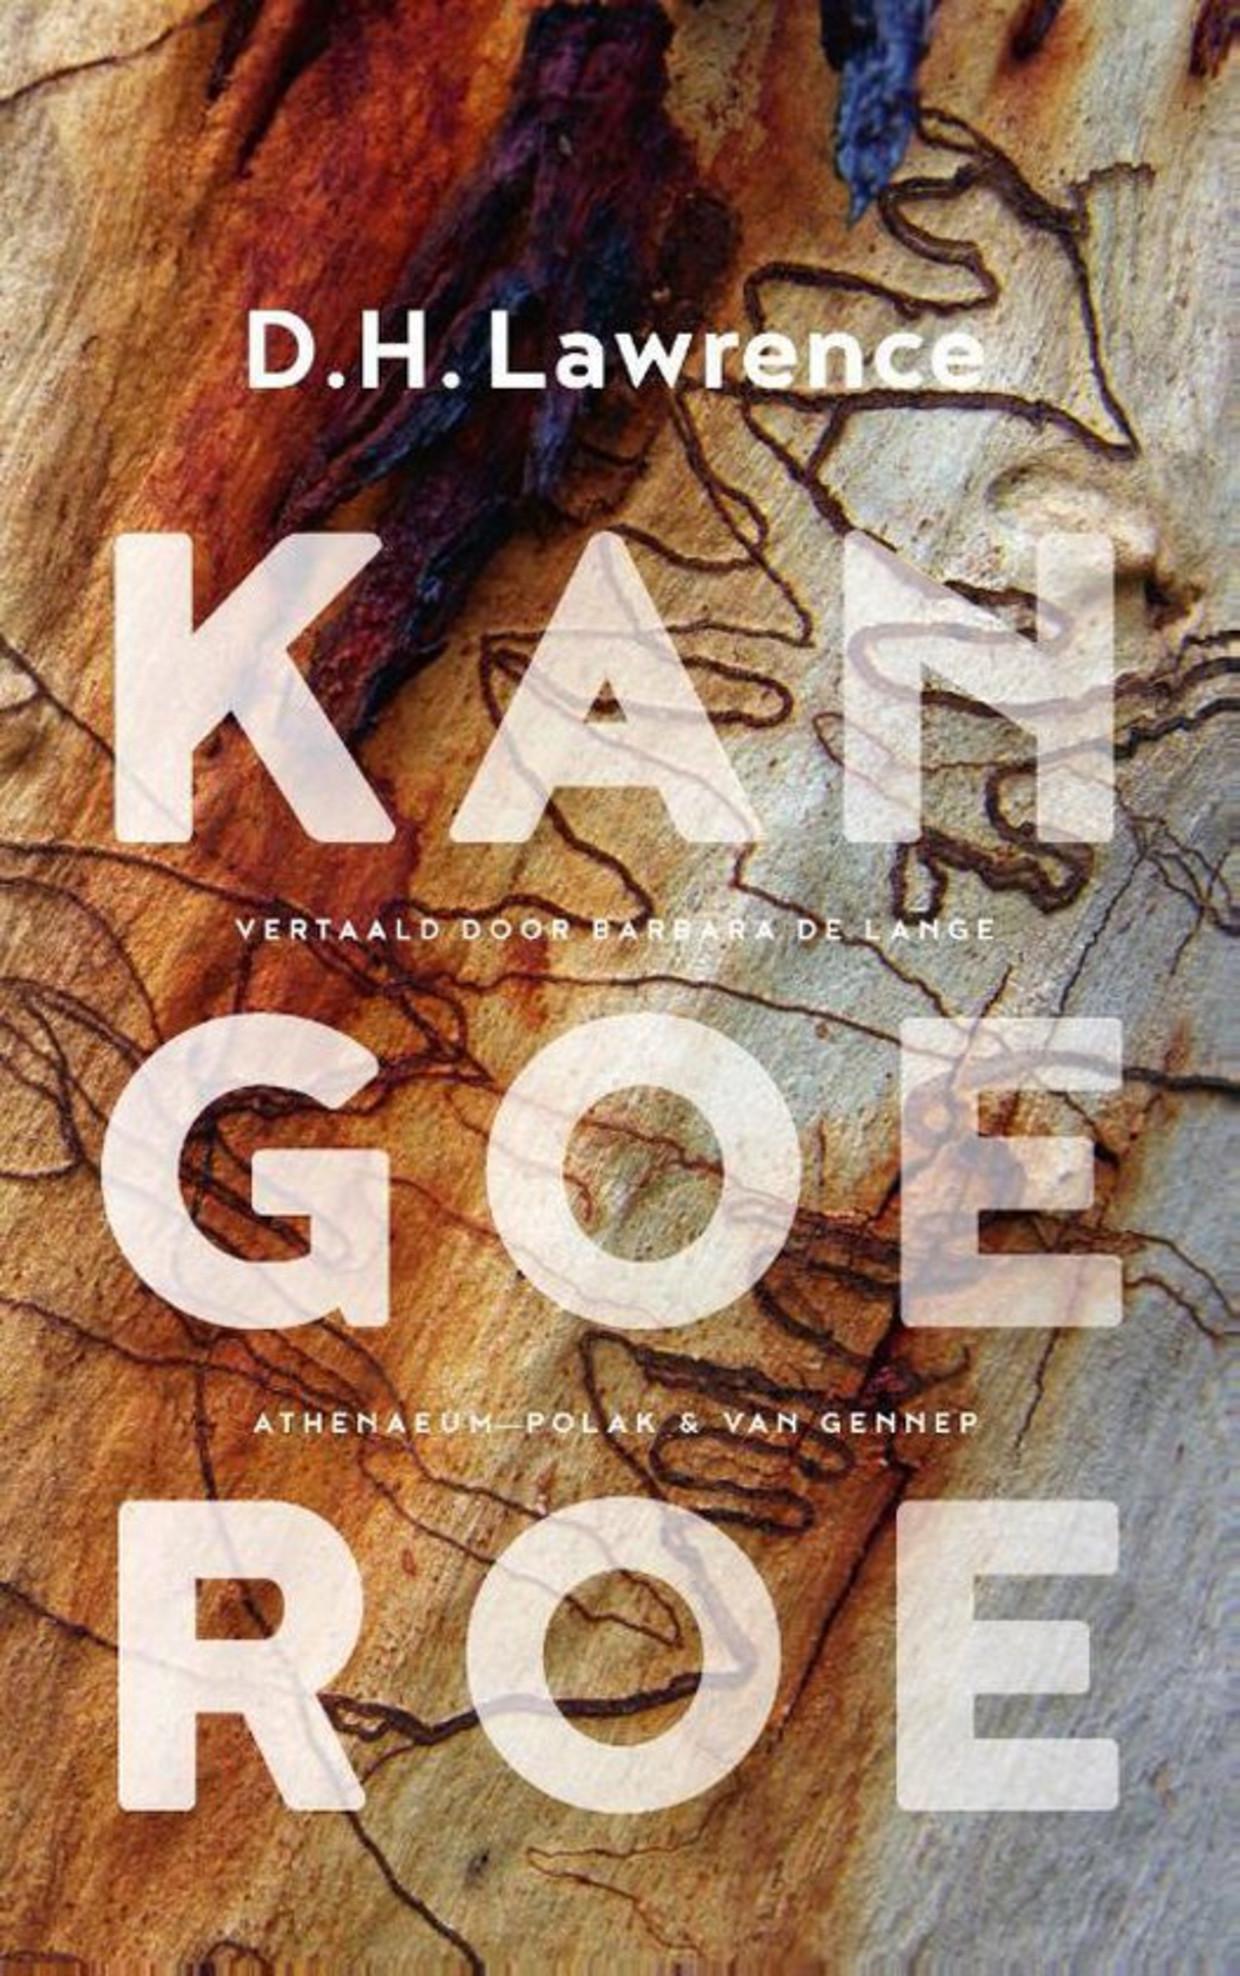 D.H. Lawrence: Kangoeroe Beeld Athenaeum